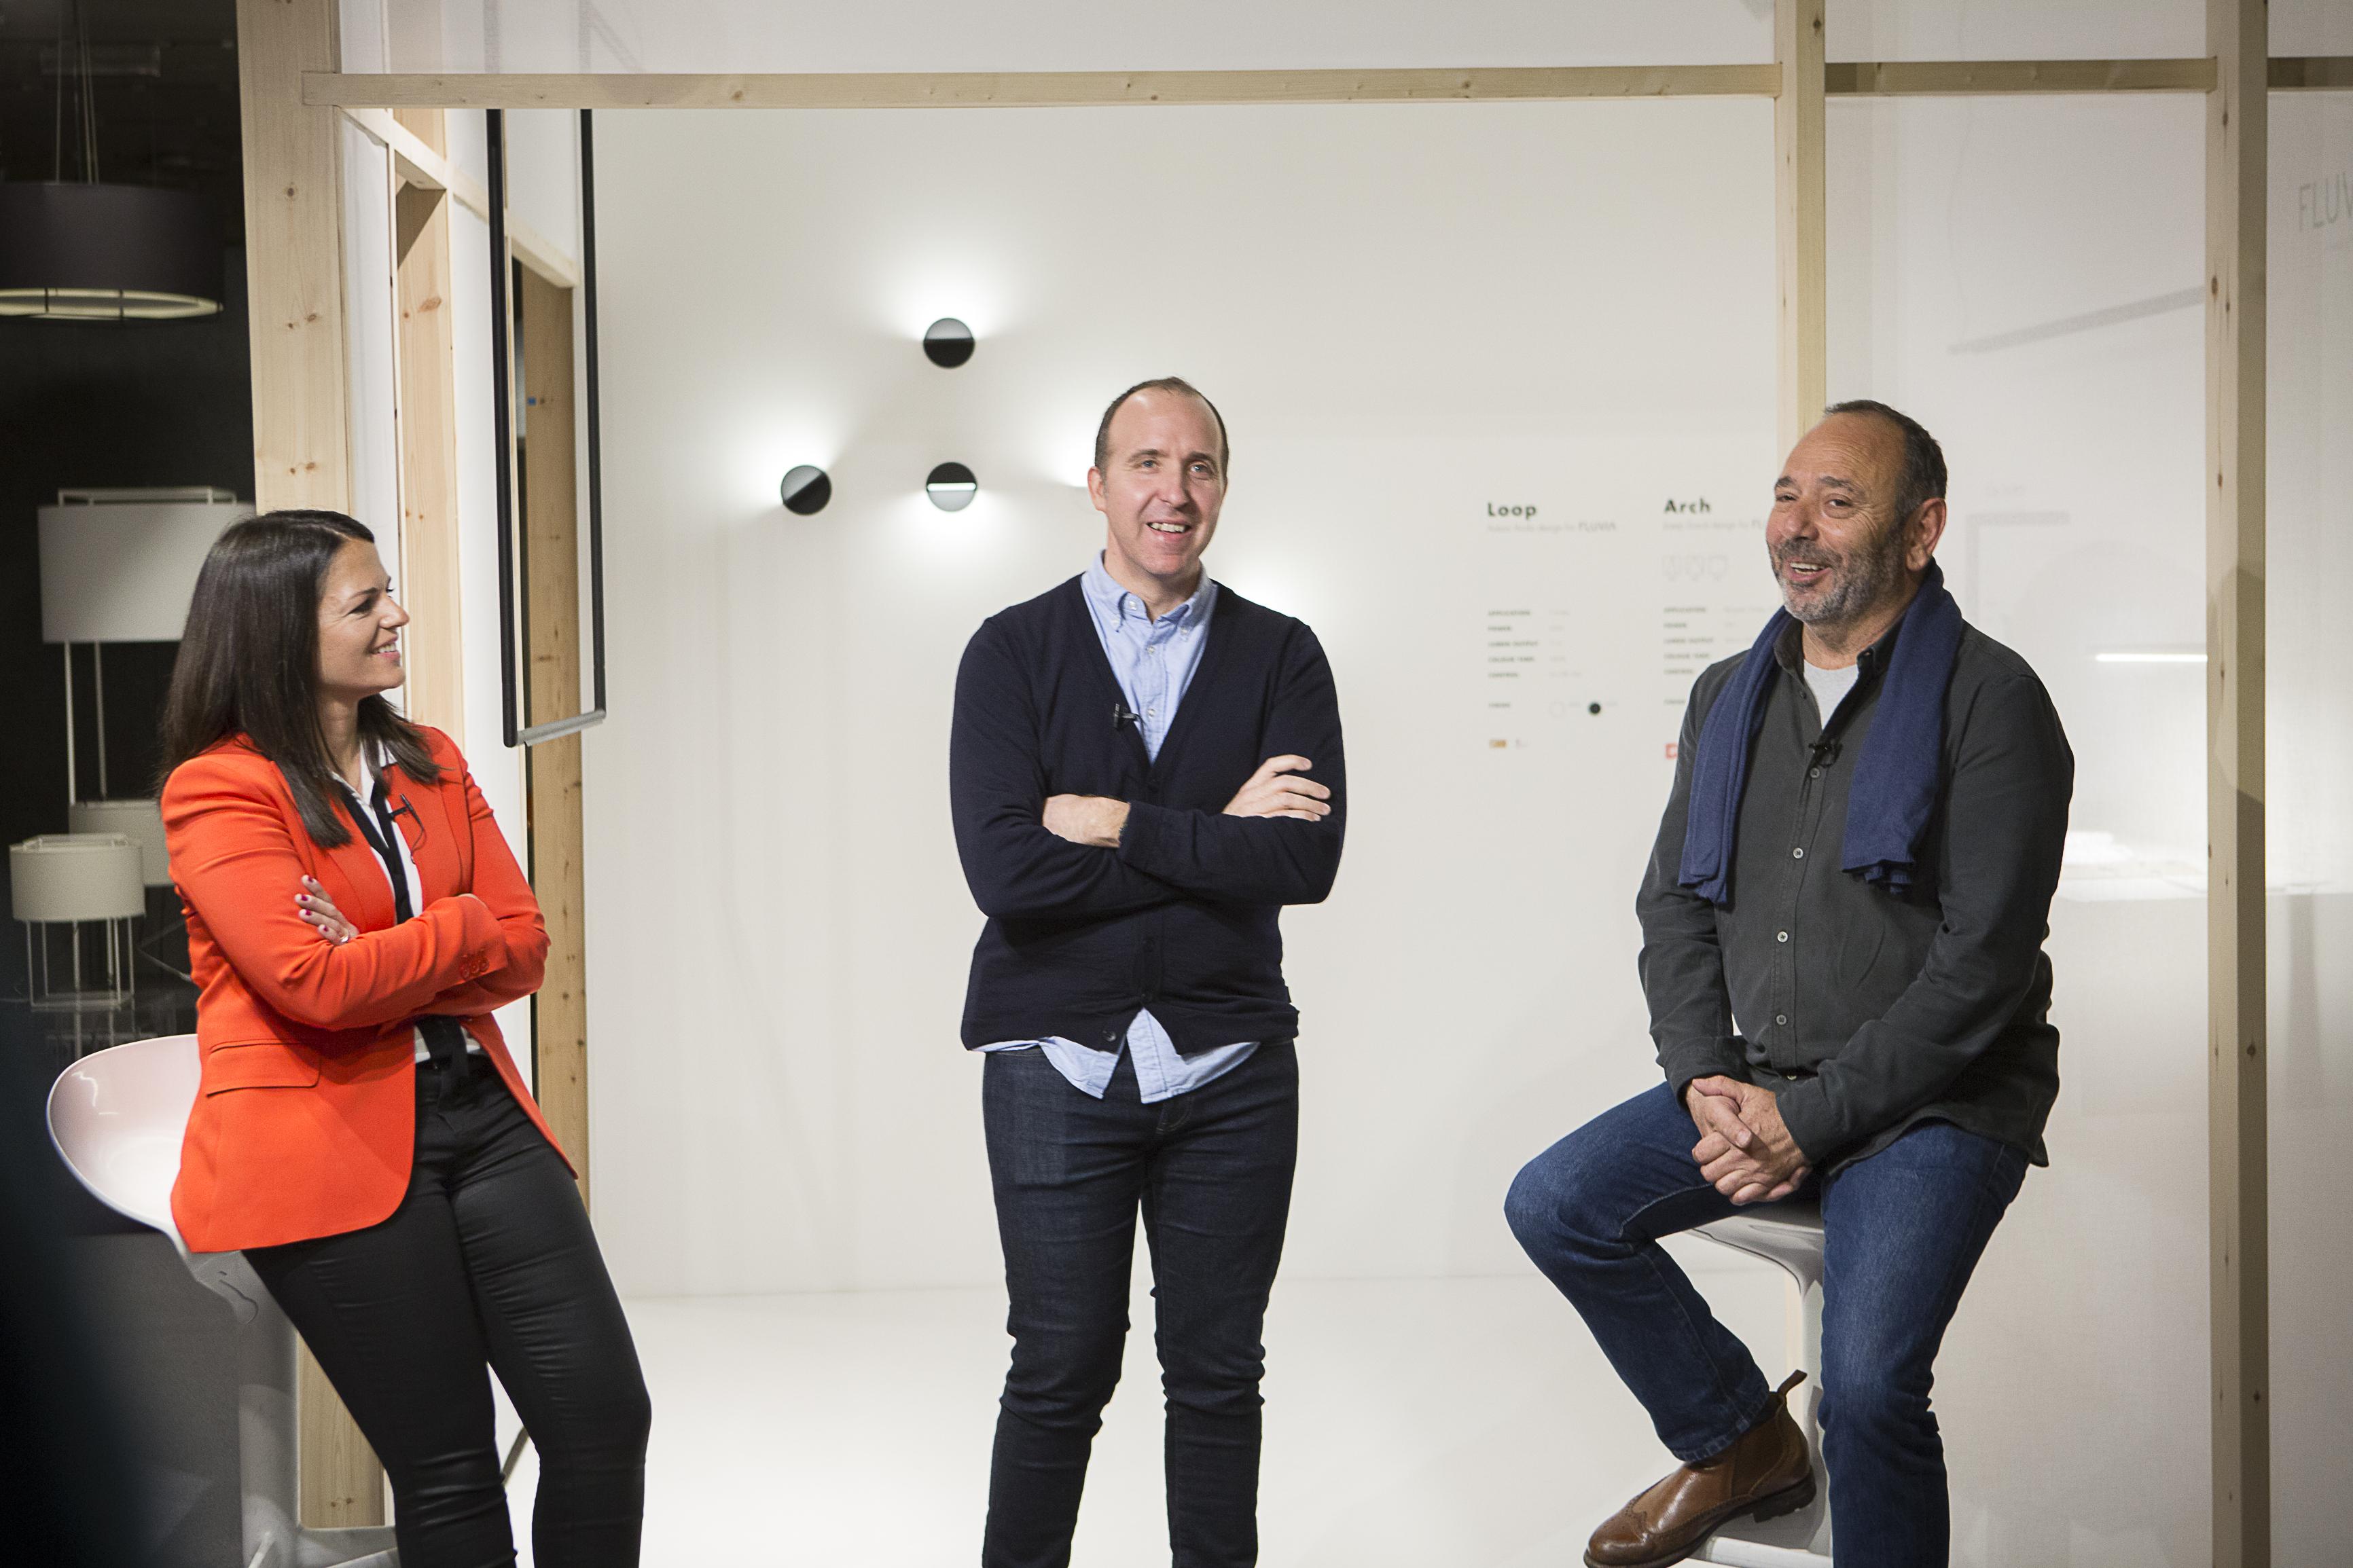 Anna Ferrer (Fluvia), Salvi Plaja (Simon) y Antoni Arola (Diseñador) durante la presentación ©airesphotospirit